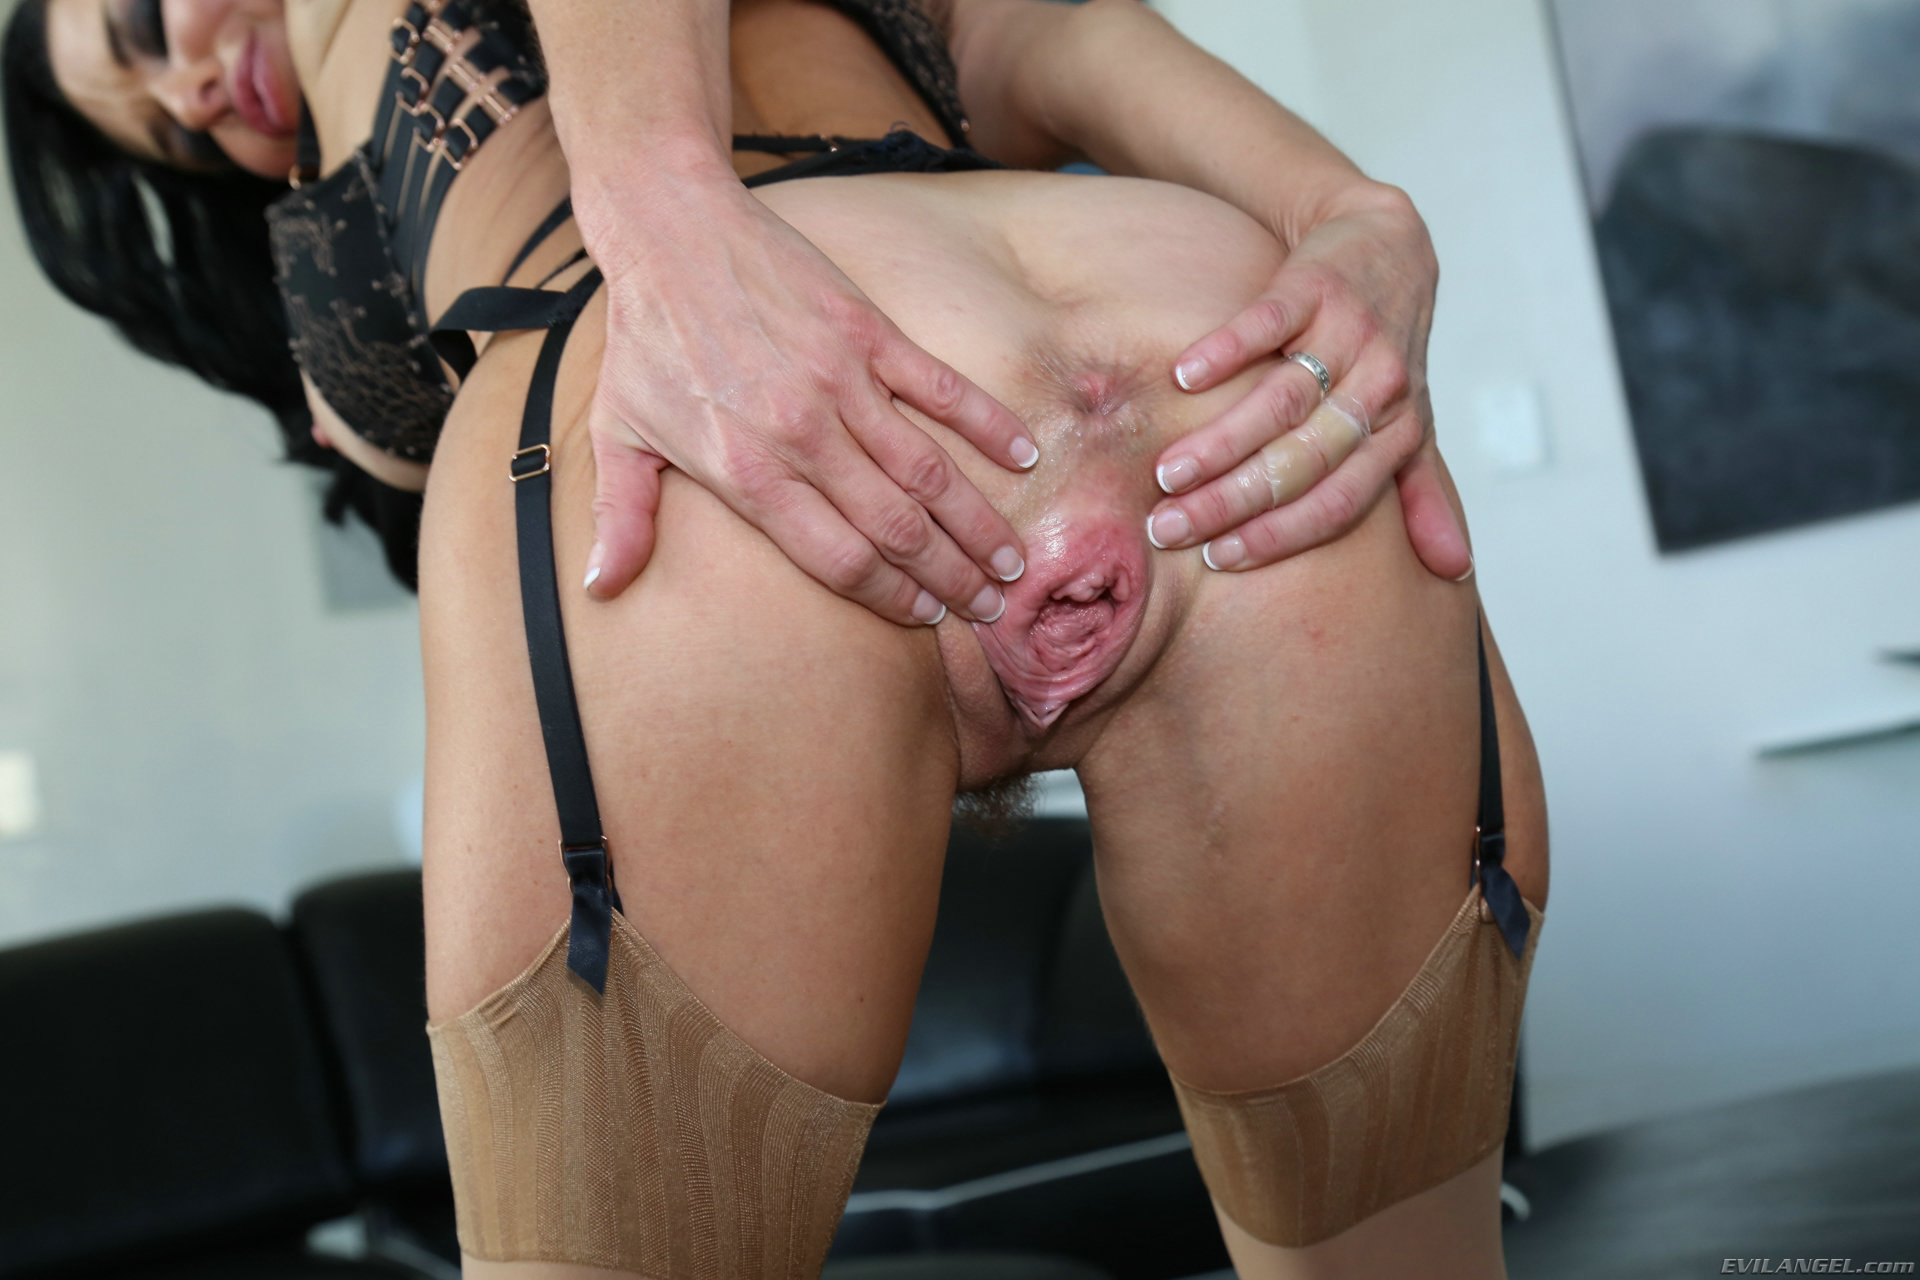 Veronica Avluv in nylons spreading her pussy - My Pornstar ...